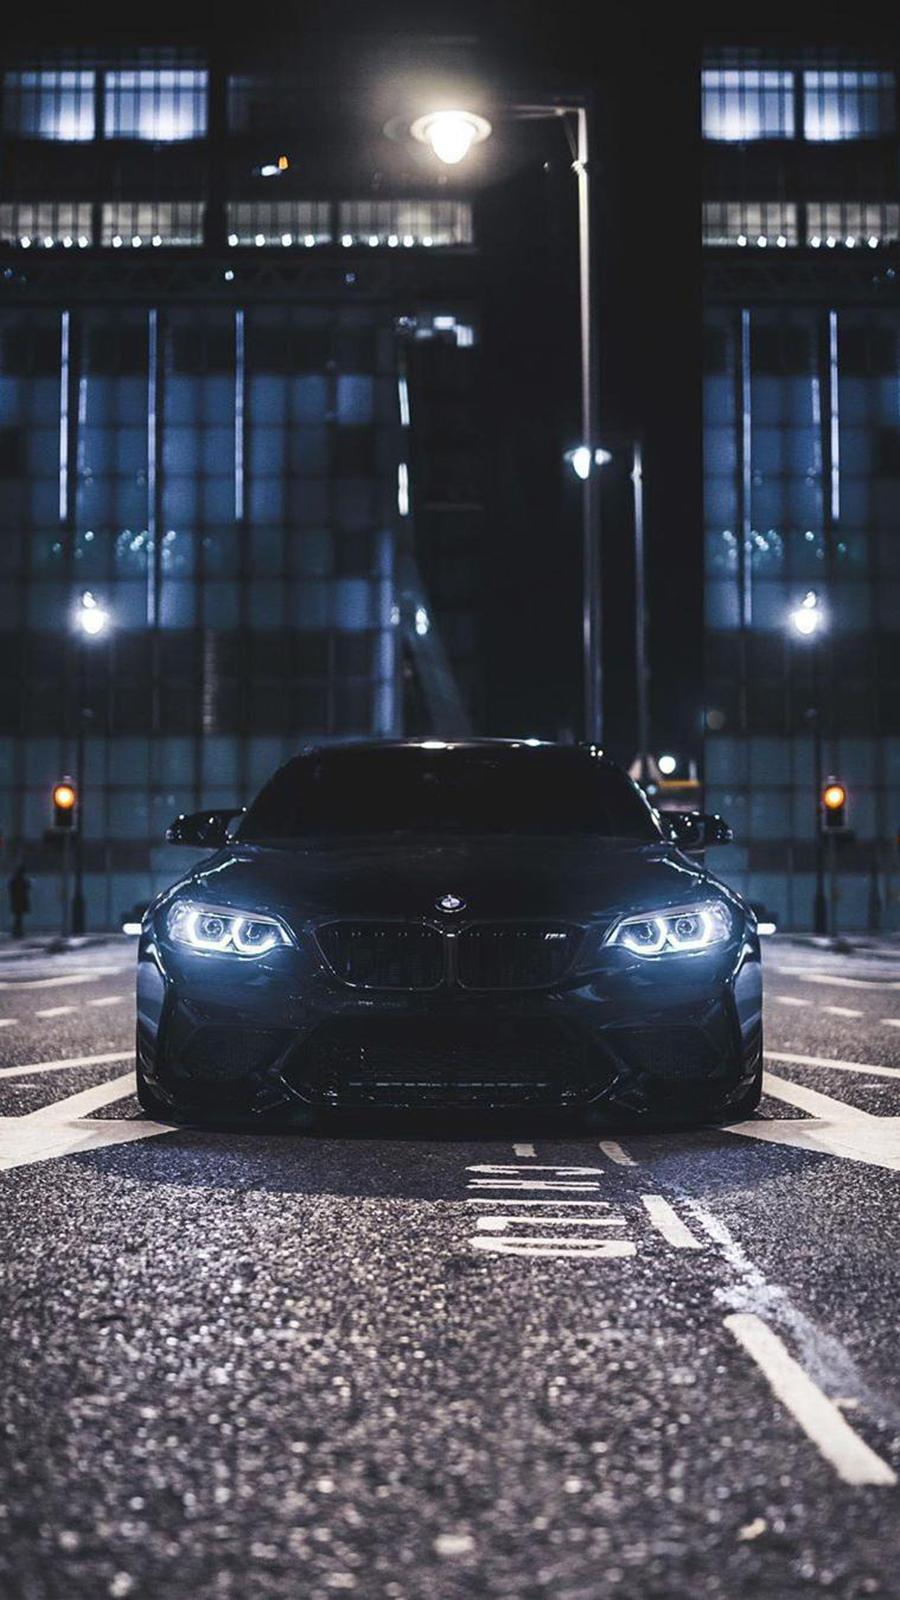 Black Bmw Wallpaper – Most Popular BMW Wallpapers Free Download